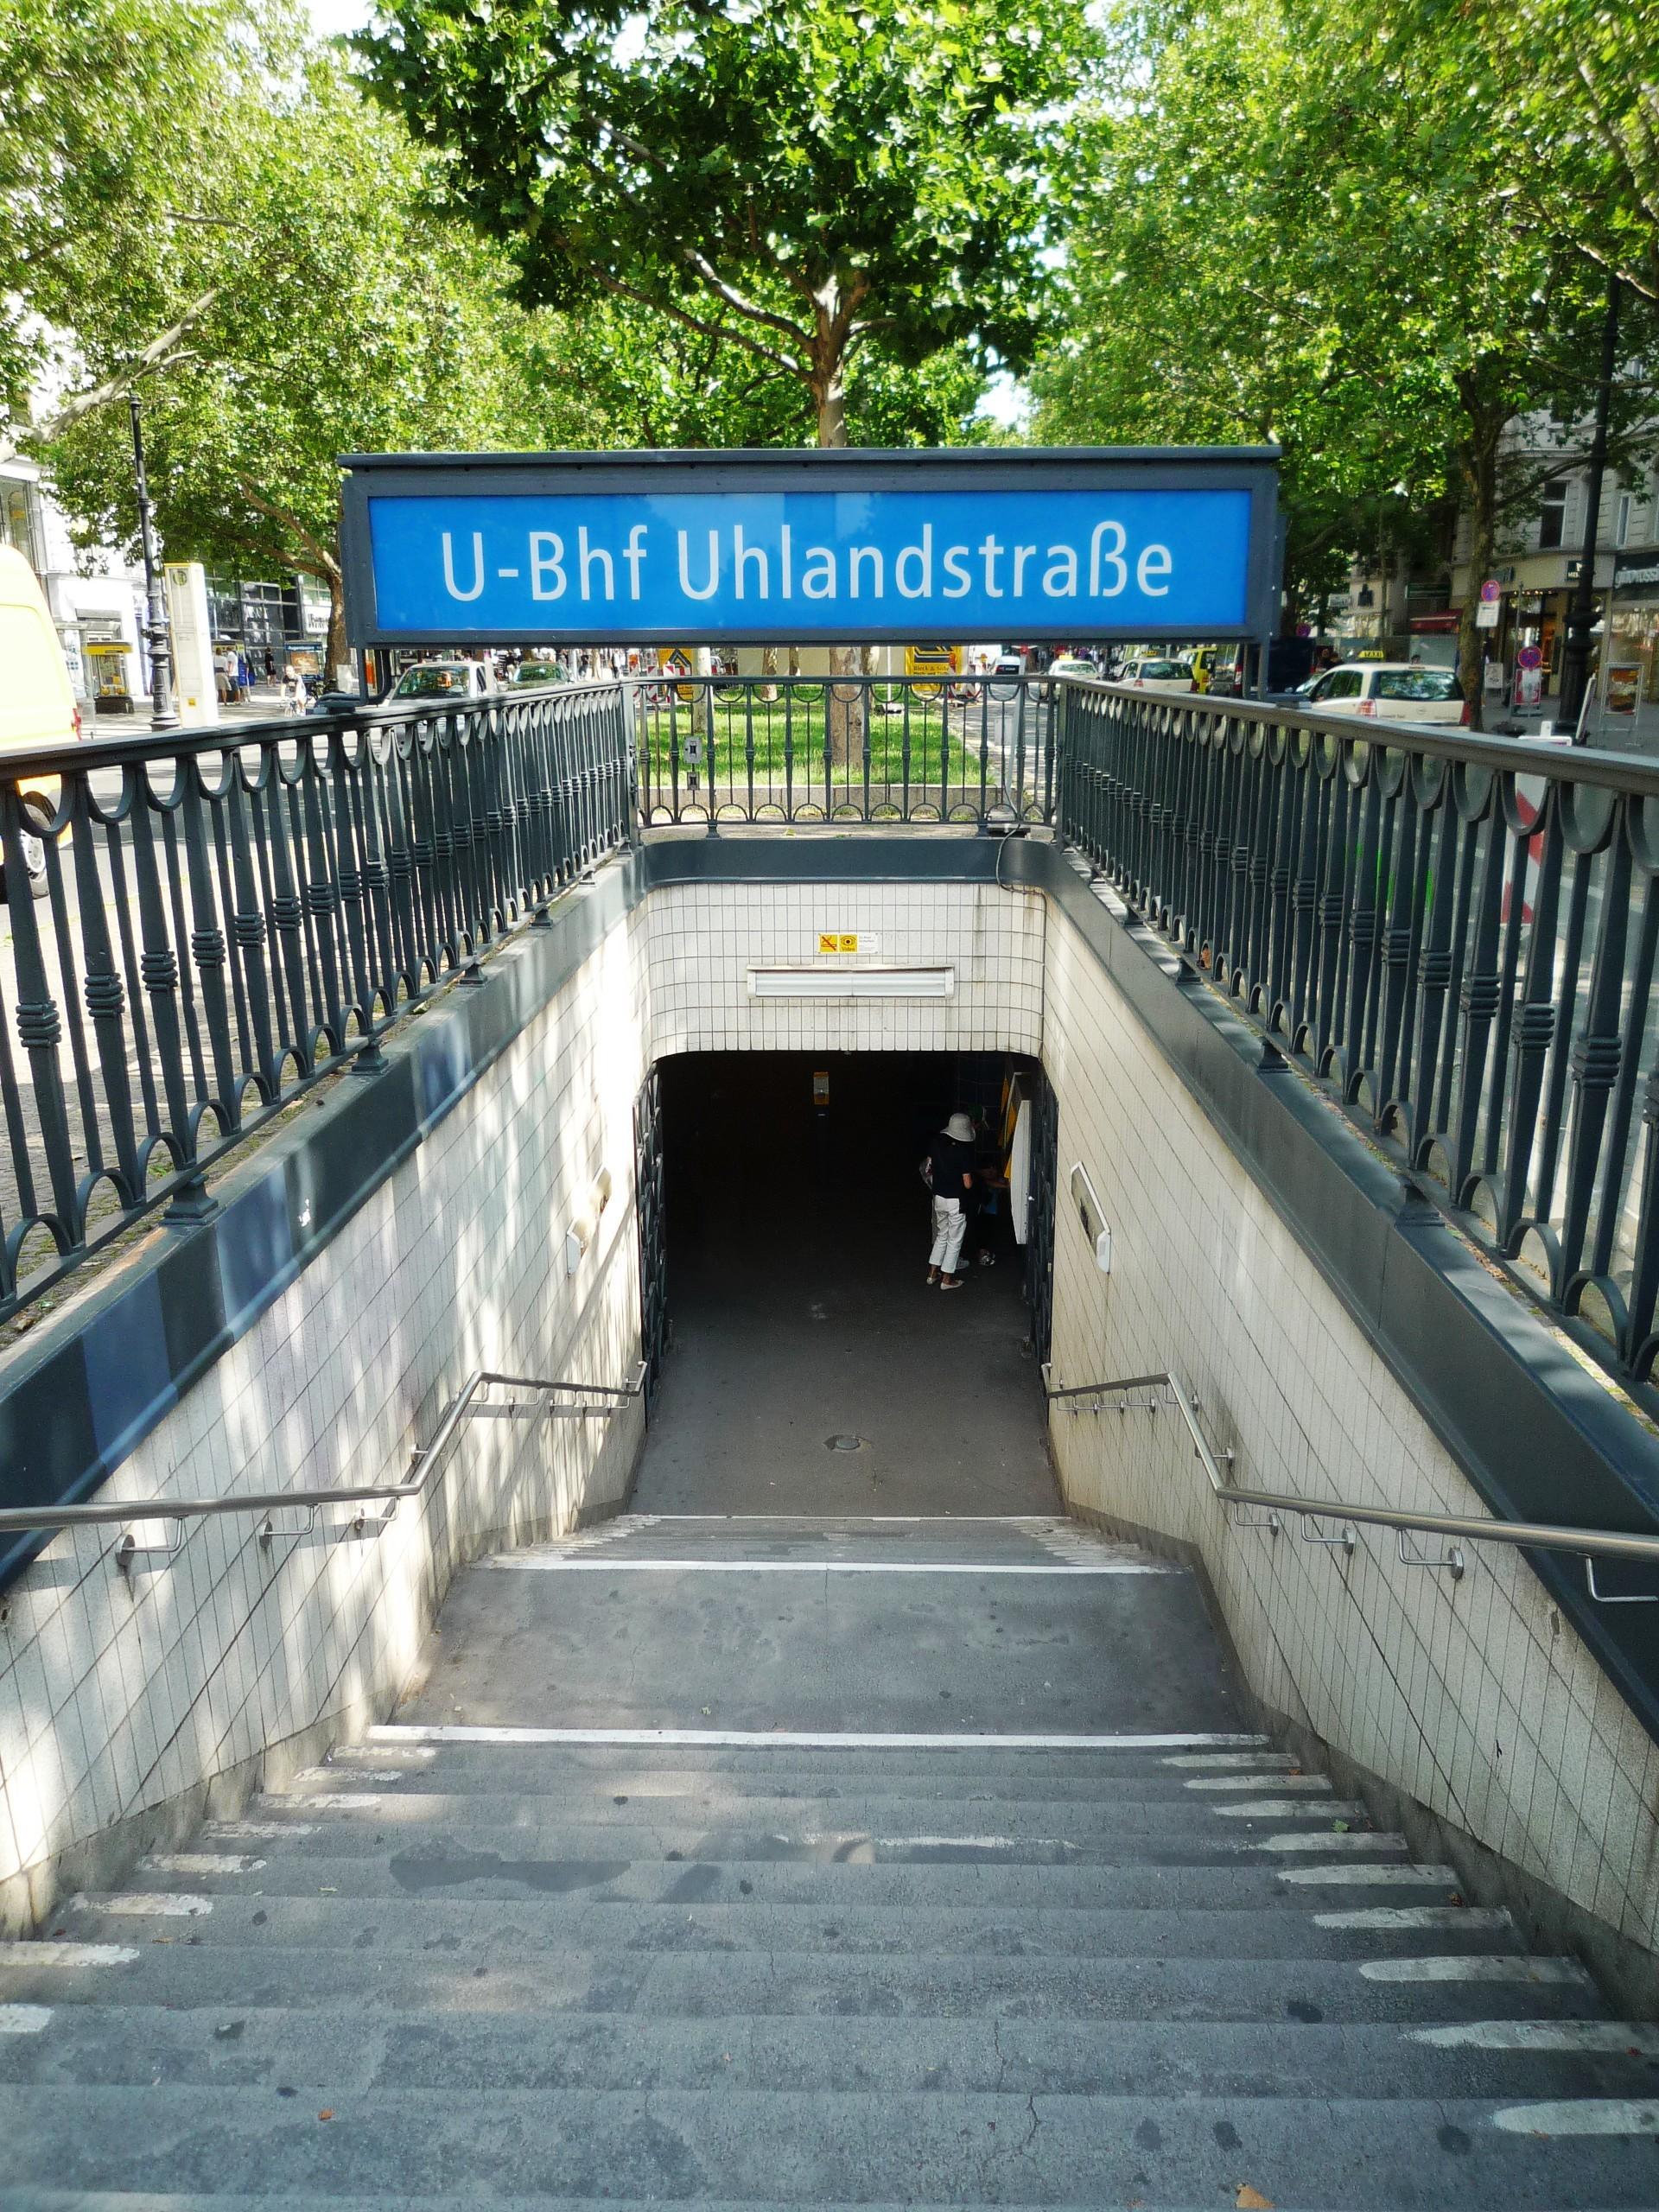 FileUBahnhof Uhlandstrasse Berlin Eingangjpg